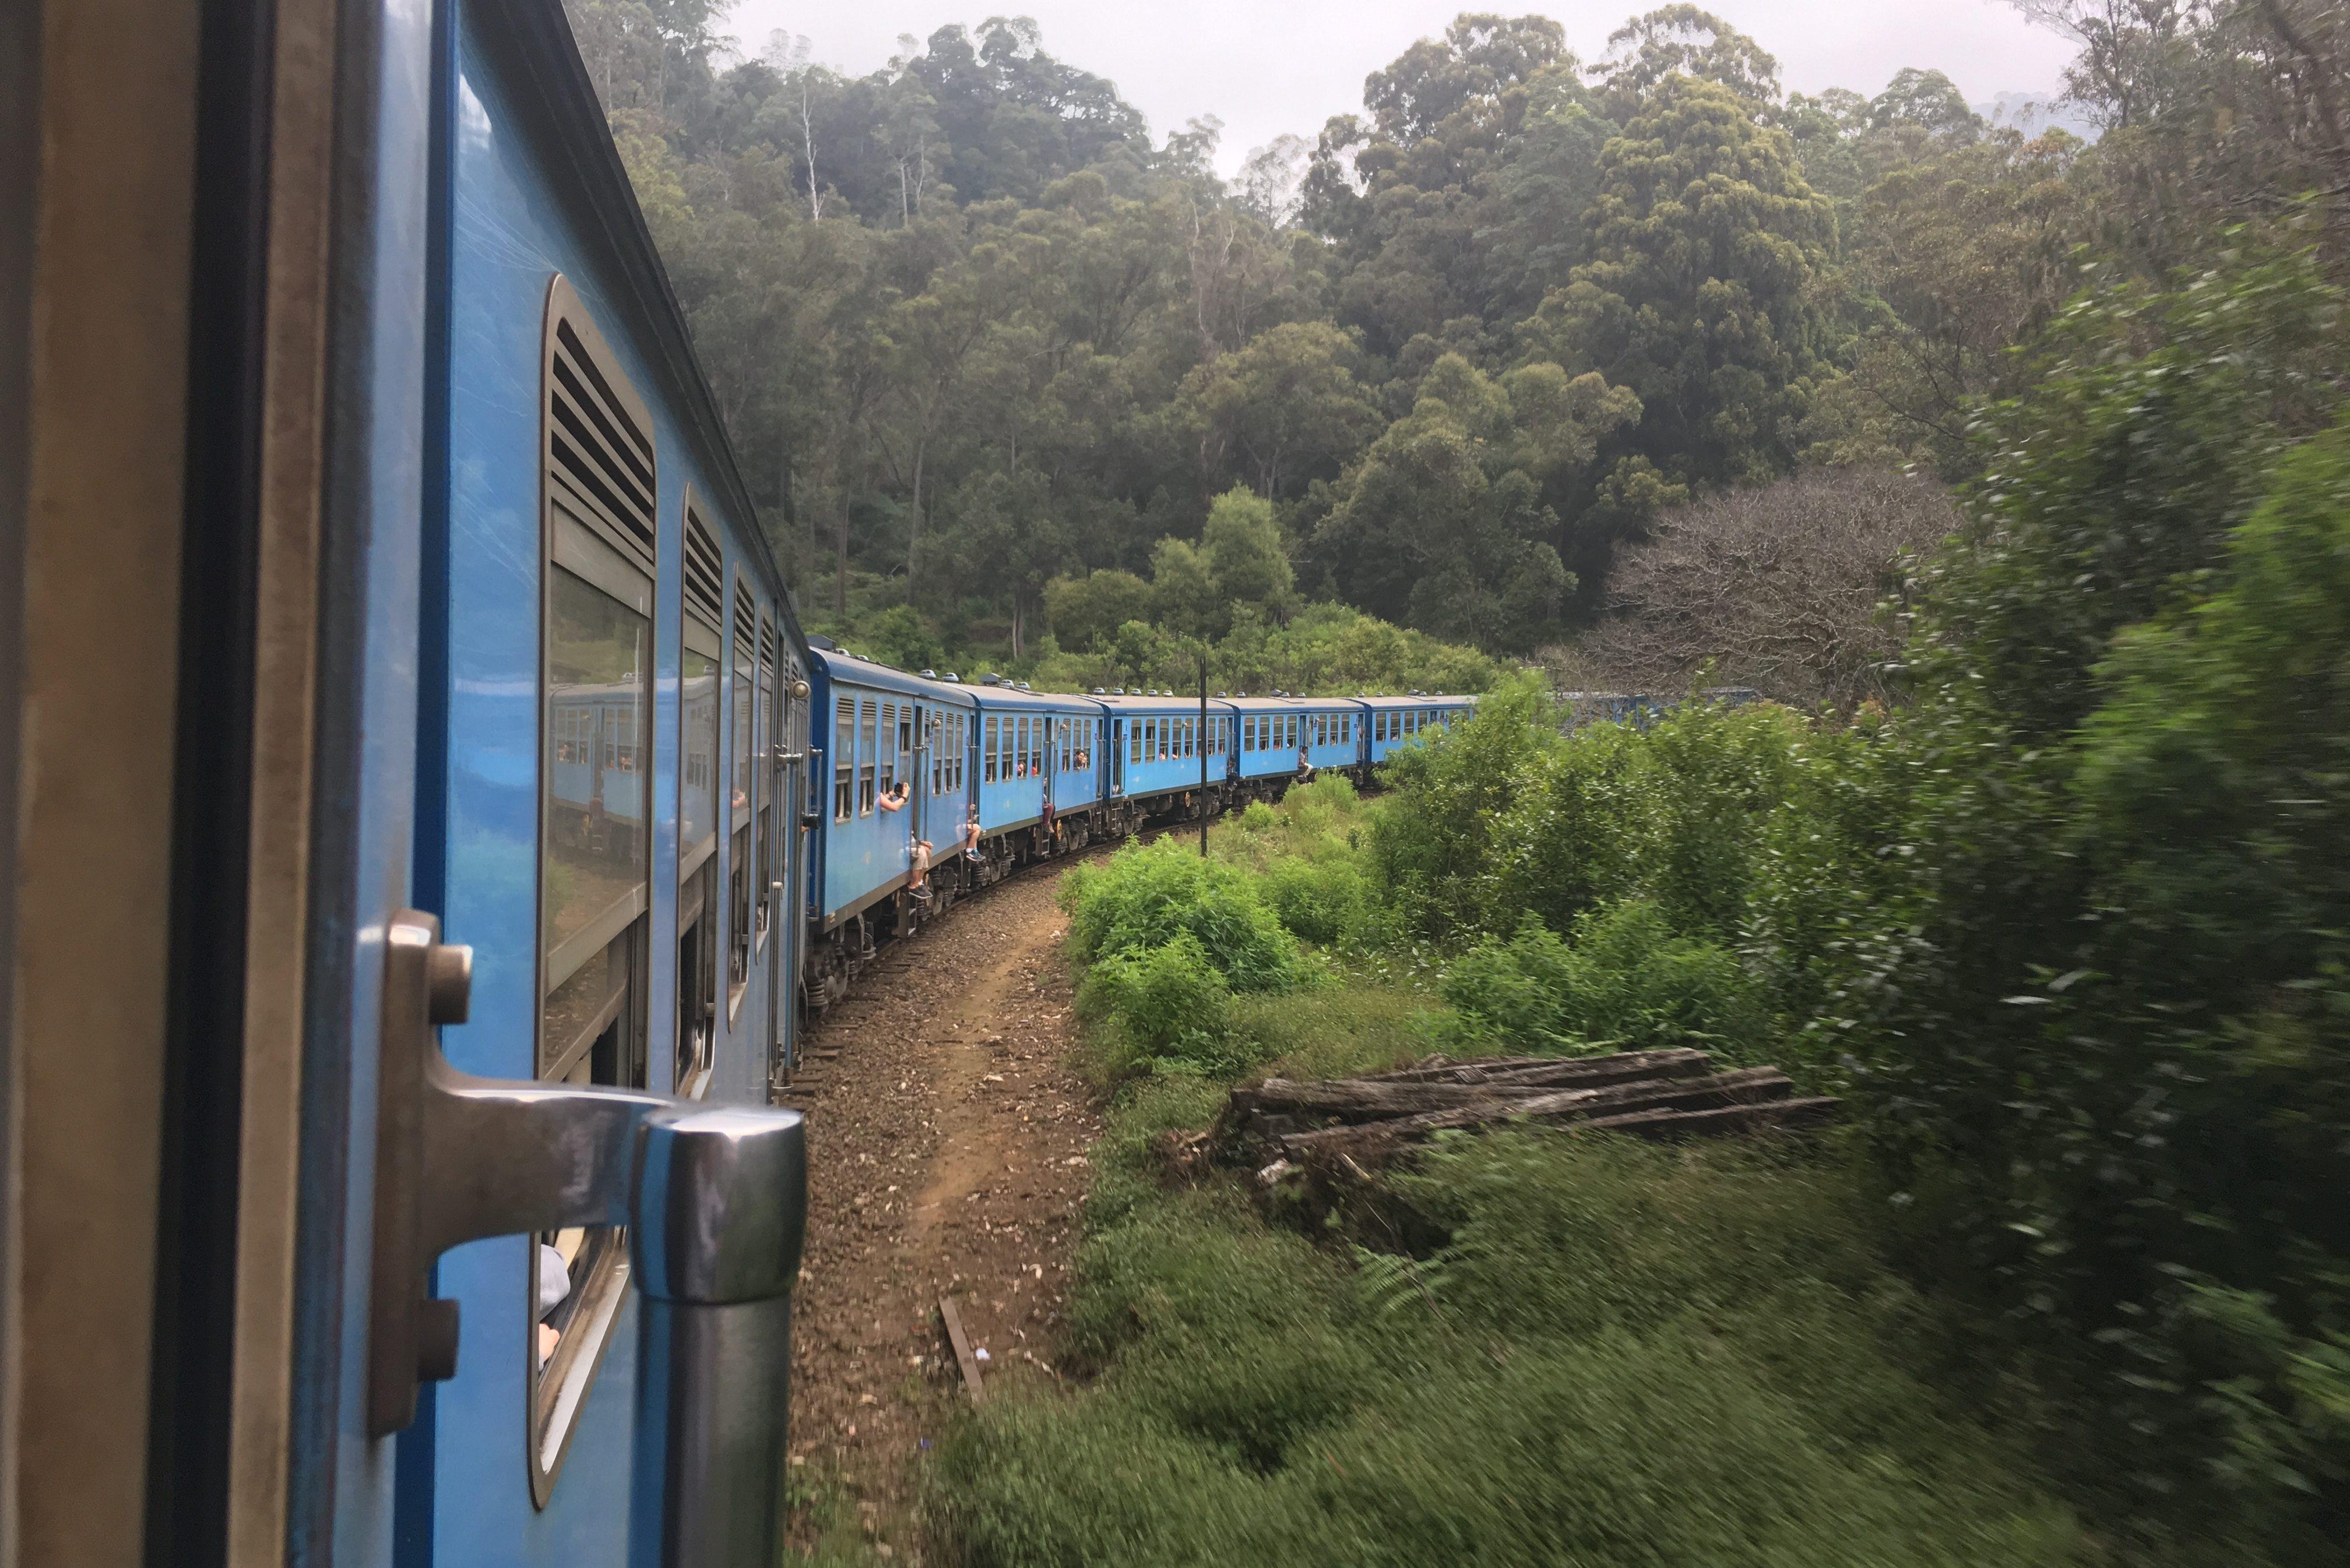 Speed datation Sri Lanka